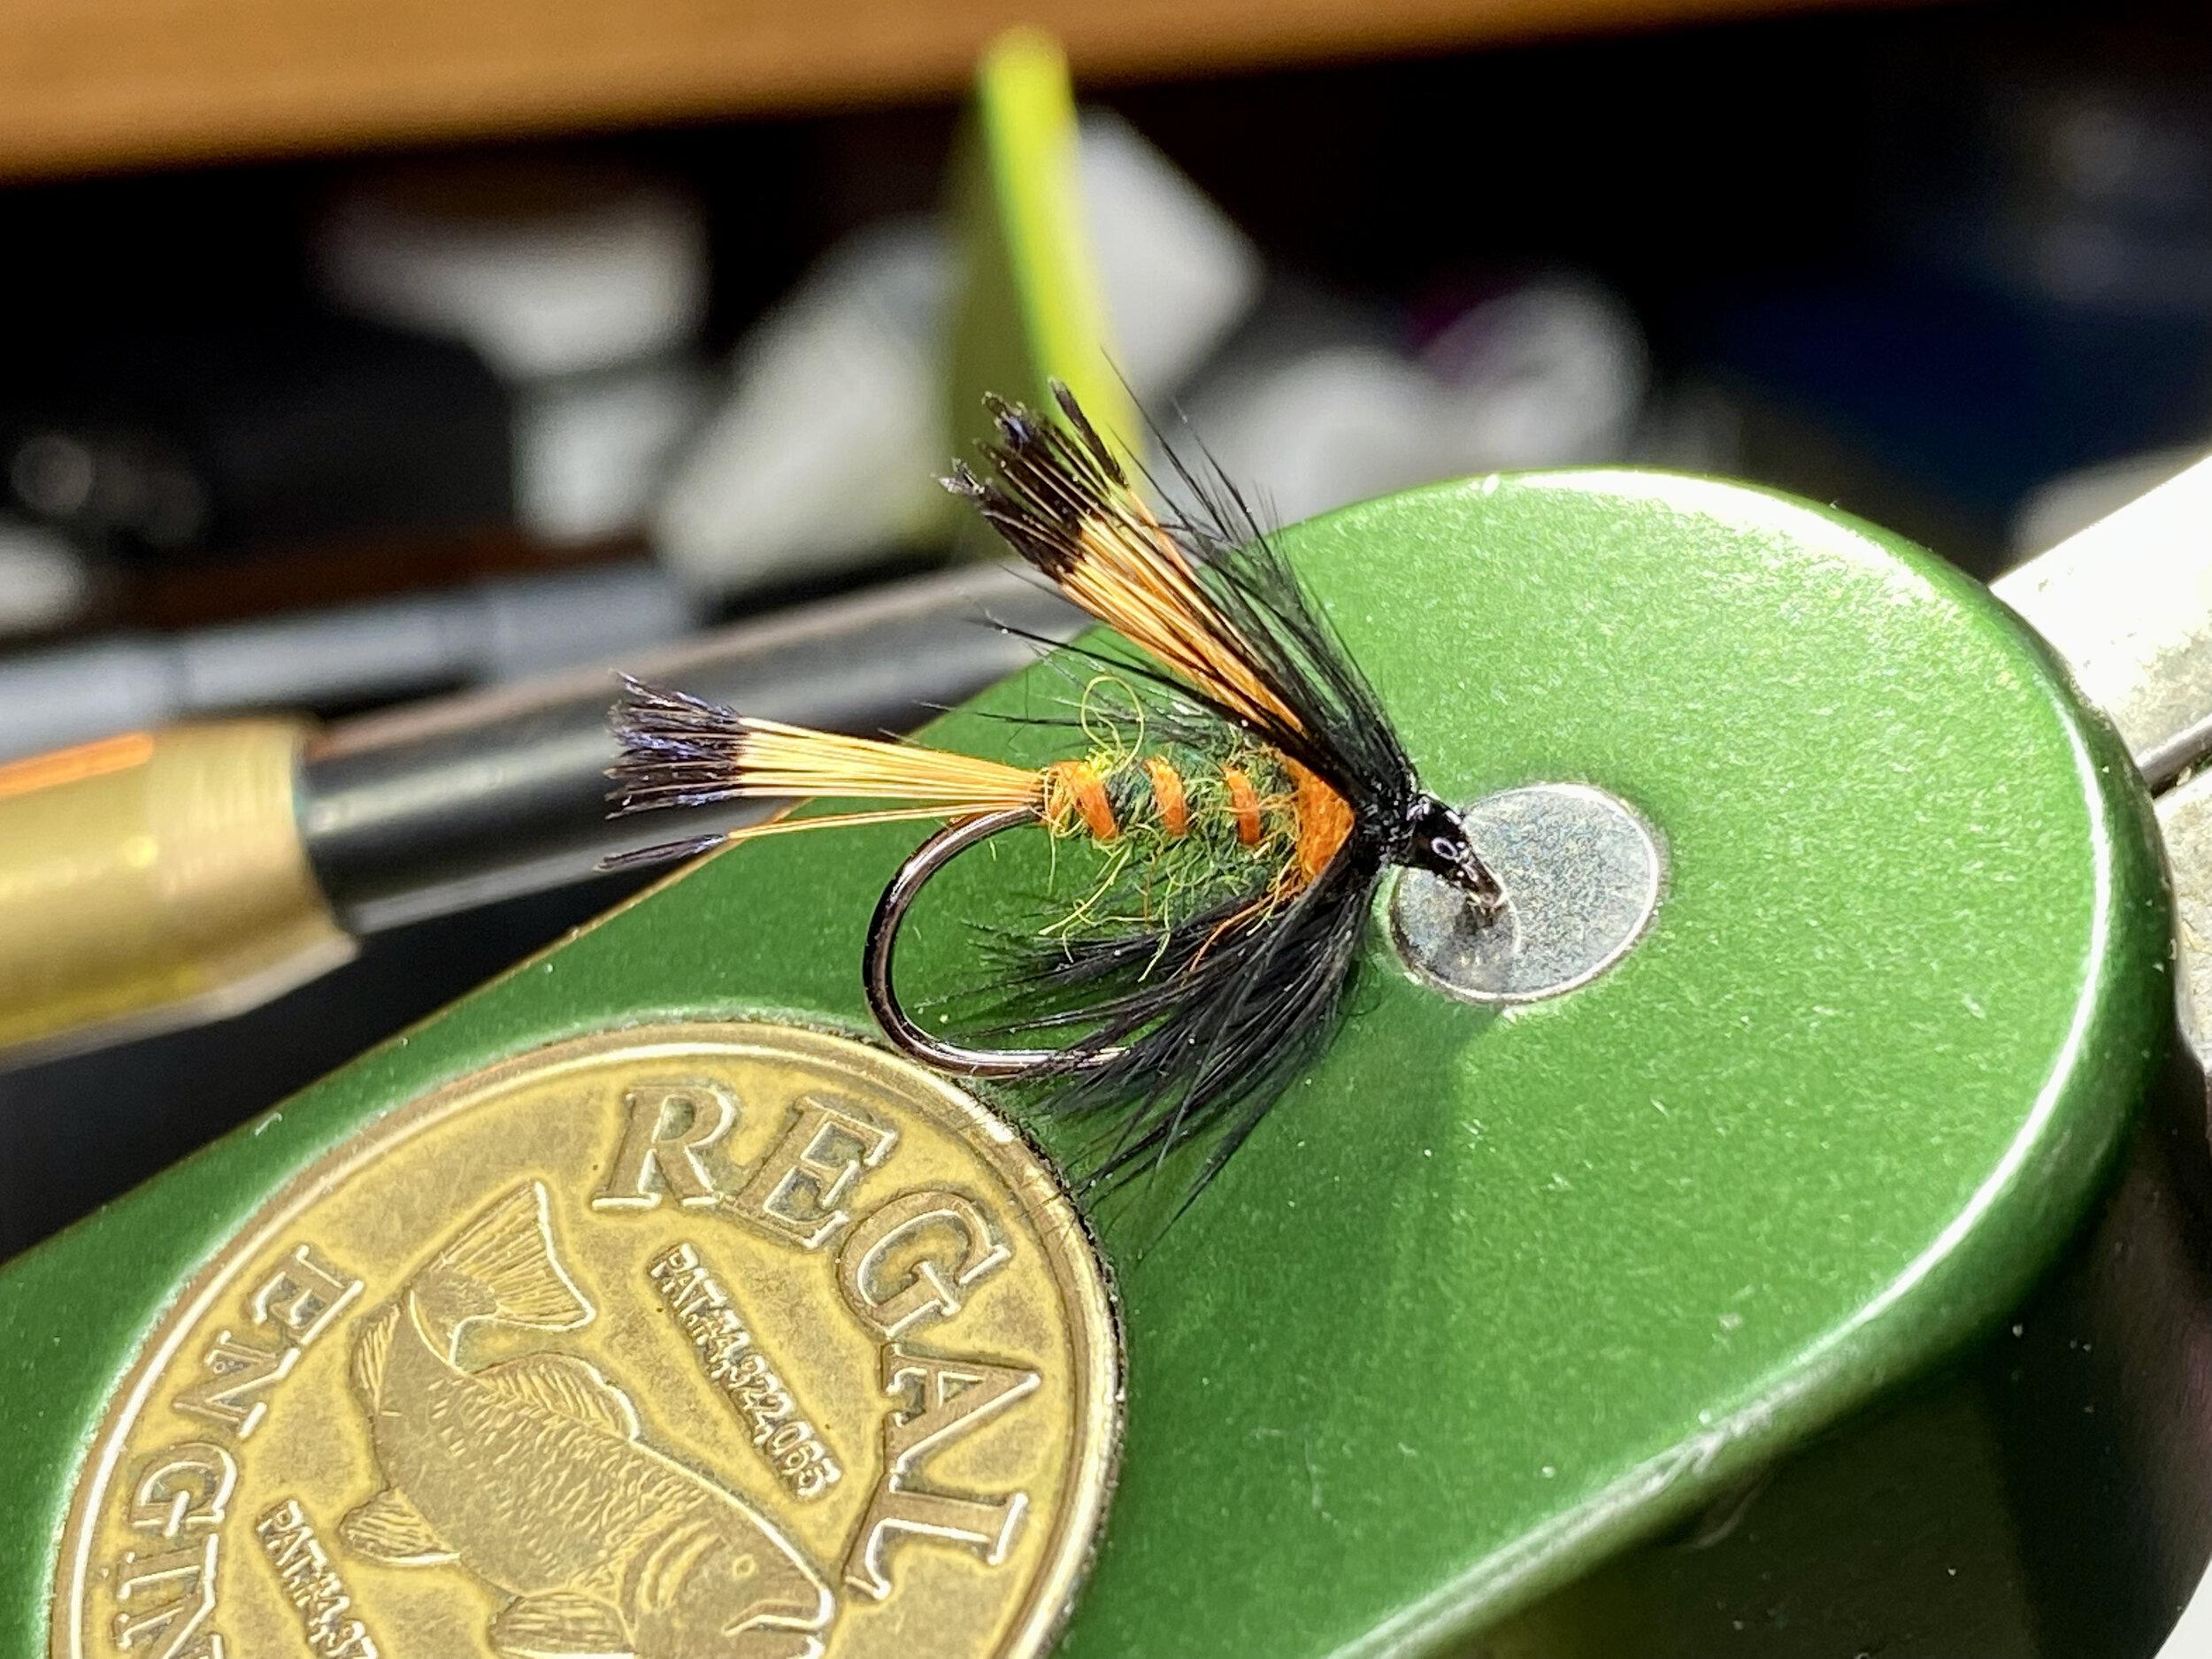 A Panfish Pazooka tied a size 12 Firehole 633 wet fly hook.